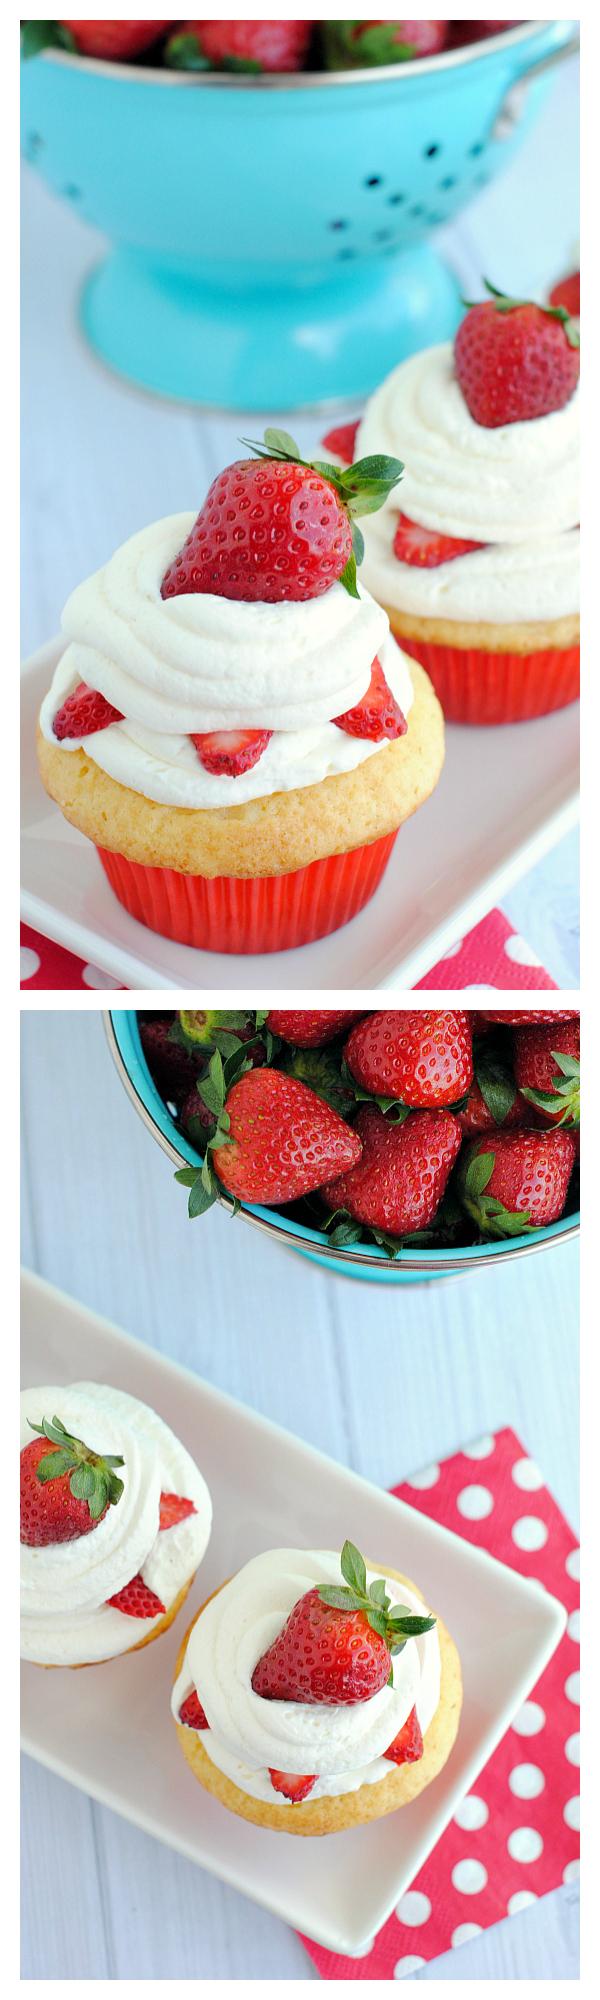 Strawberry Shortcake Cupcakes Recipe